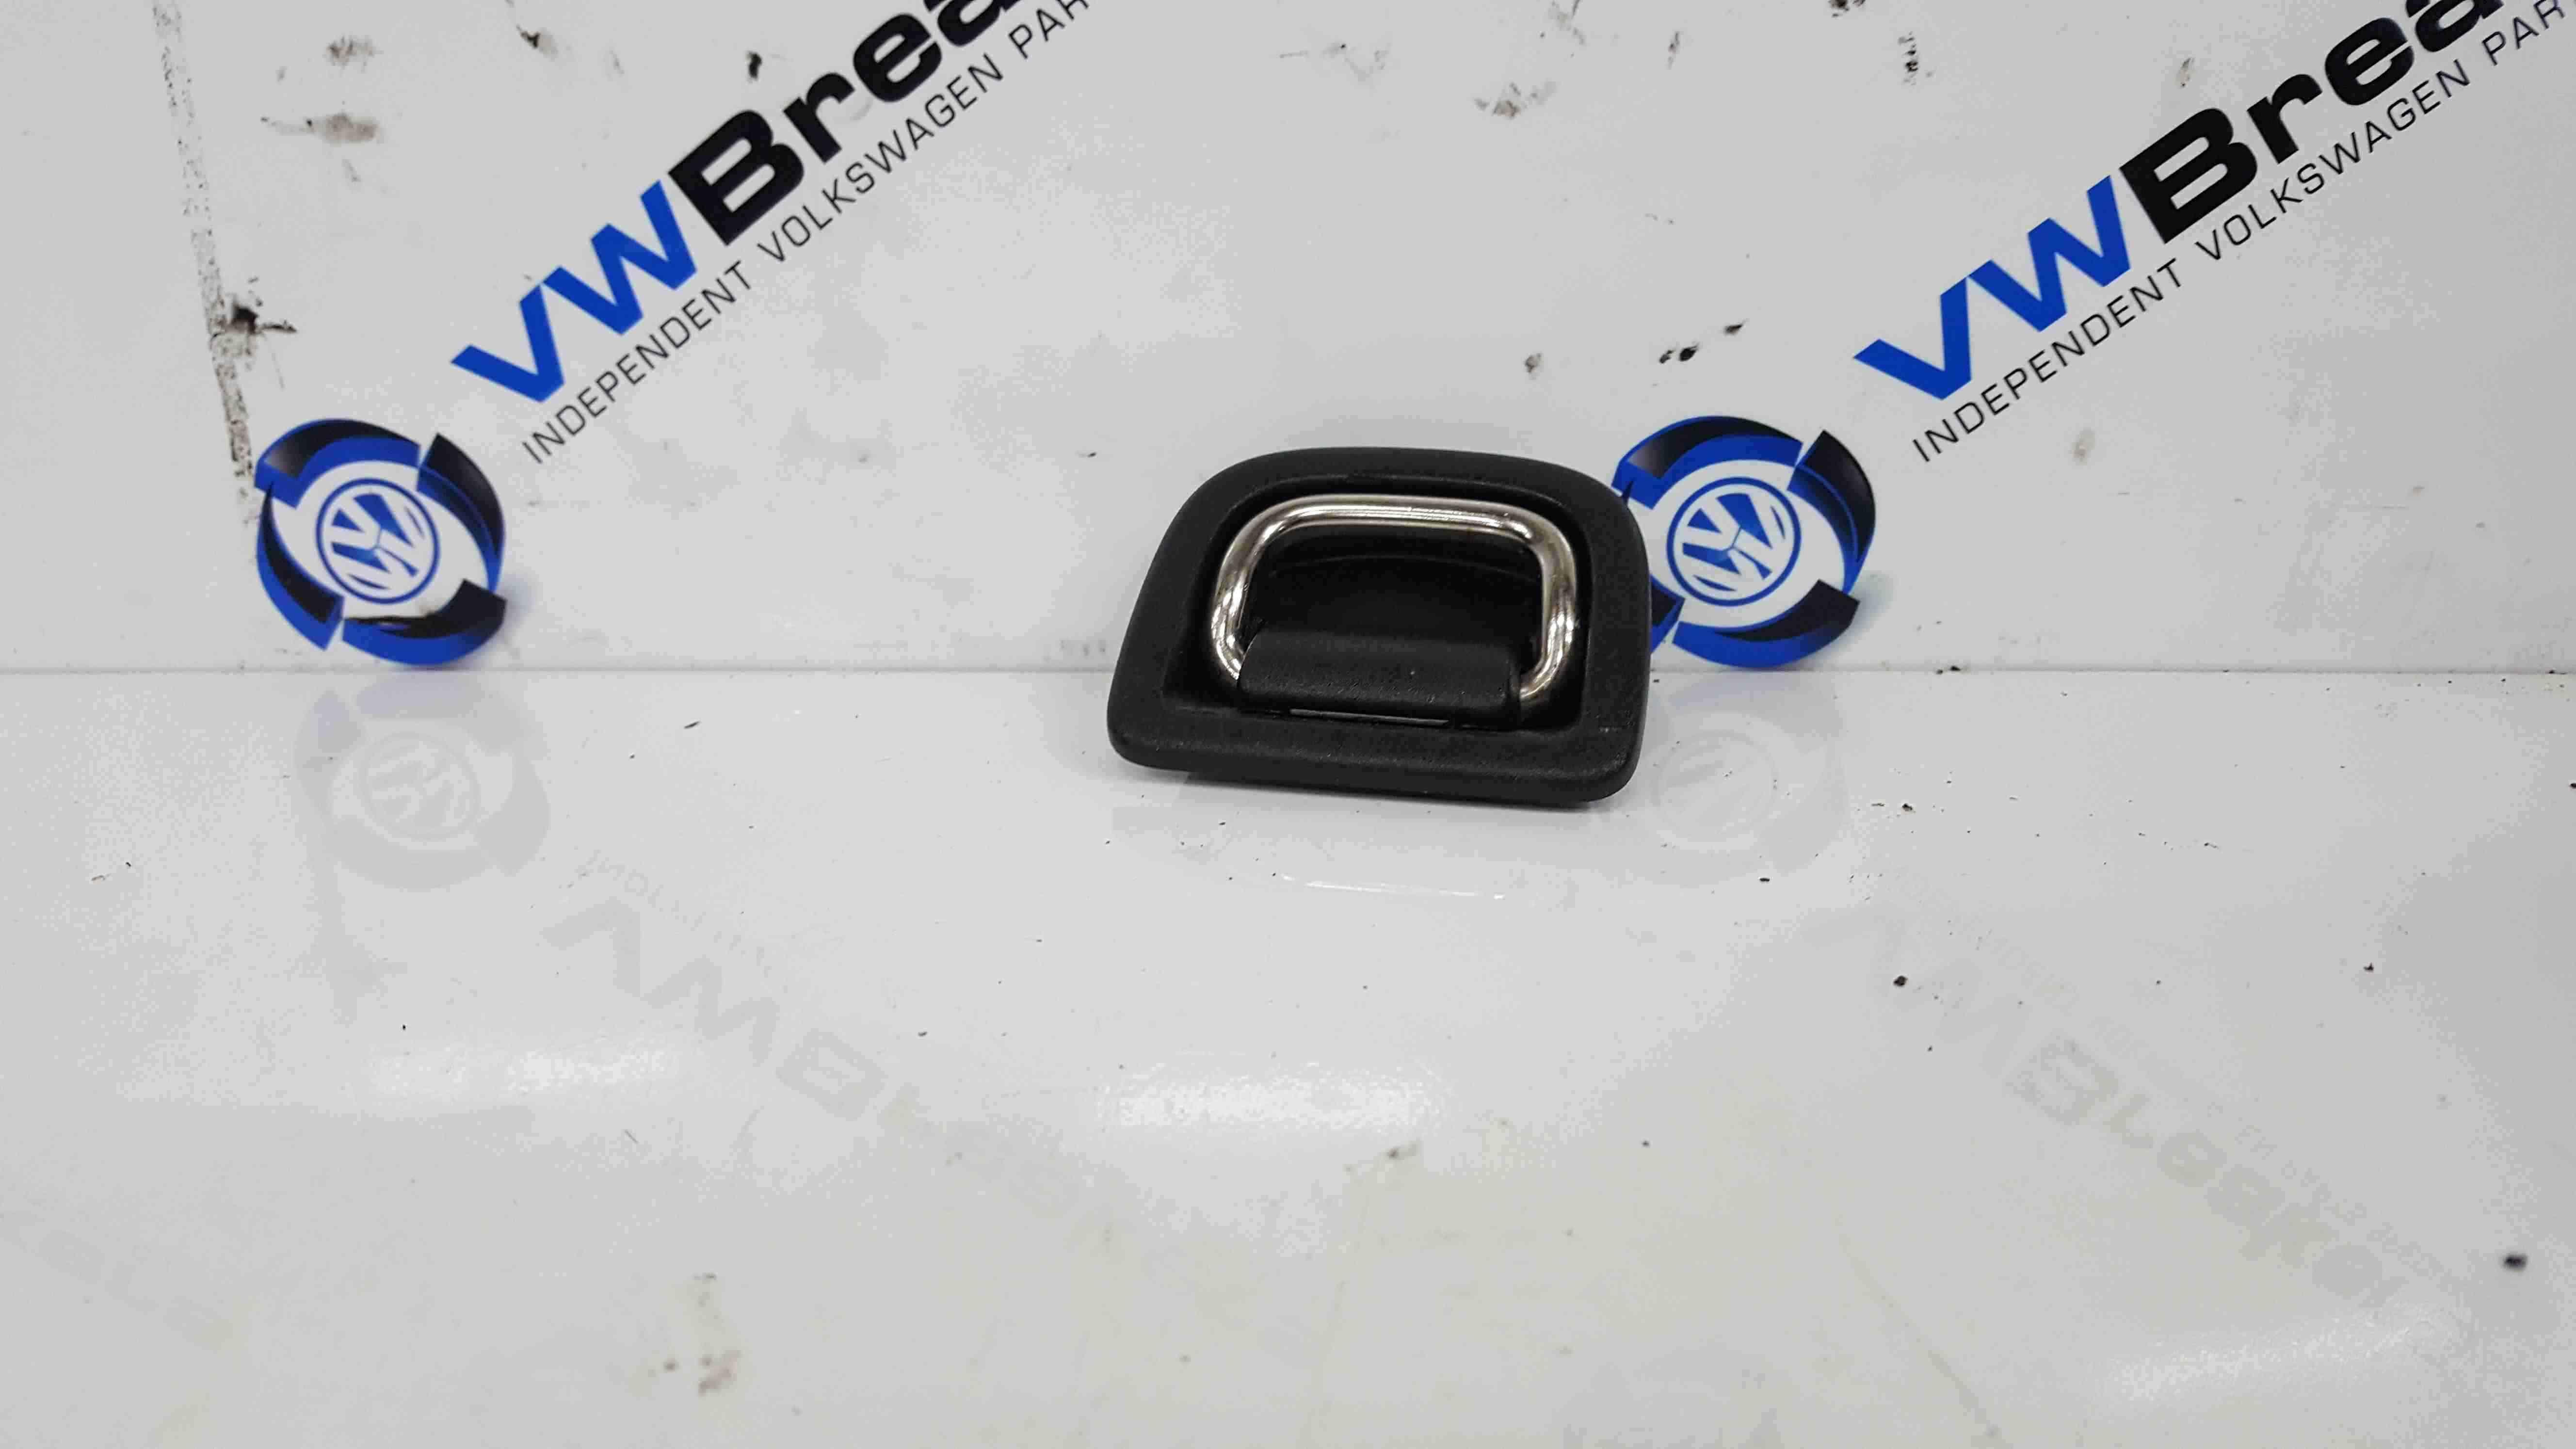 Volkswagen Golf MK7 2012-2017 Tie Down Luggage Handle Clip